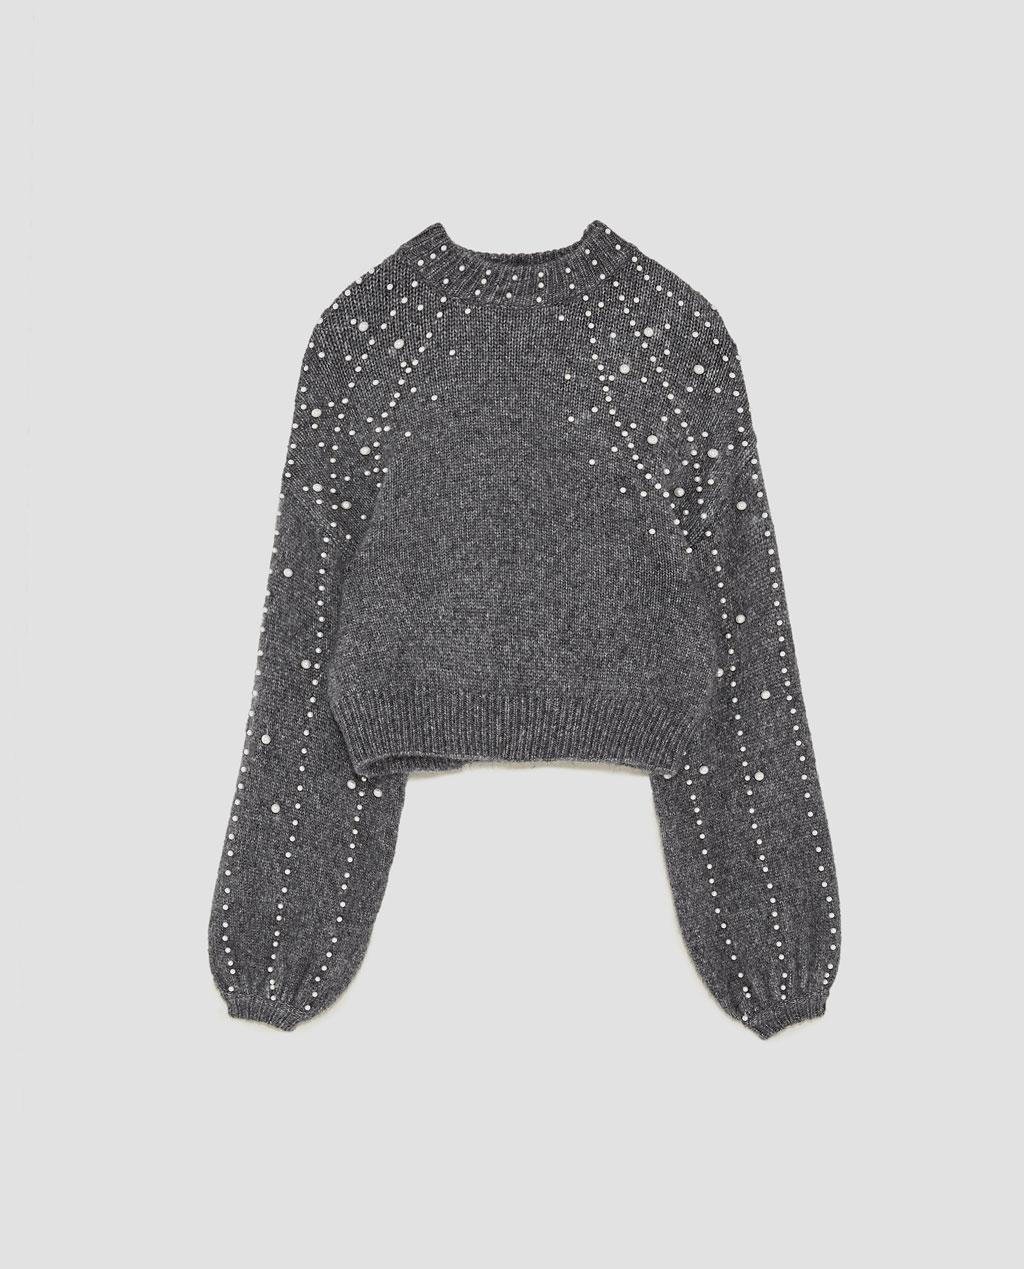 ZARA Pearl Cropped Sweater